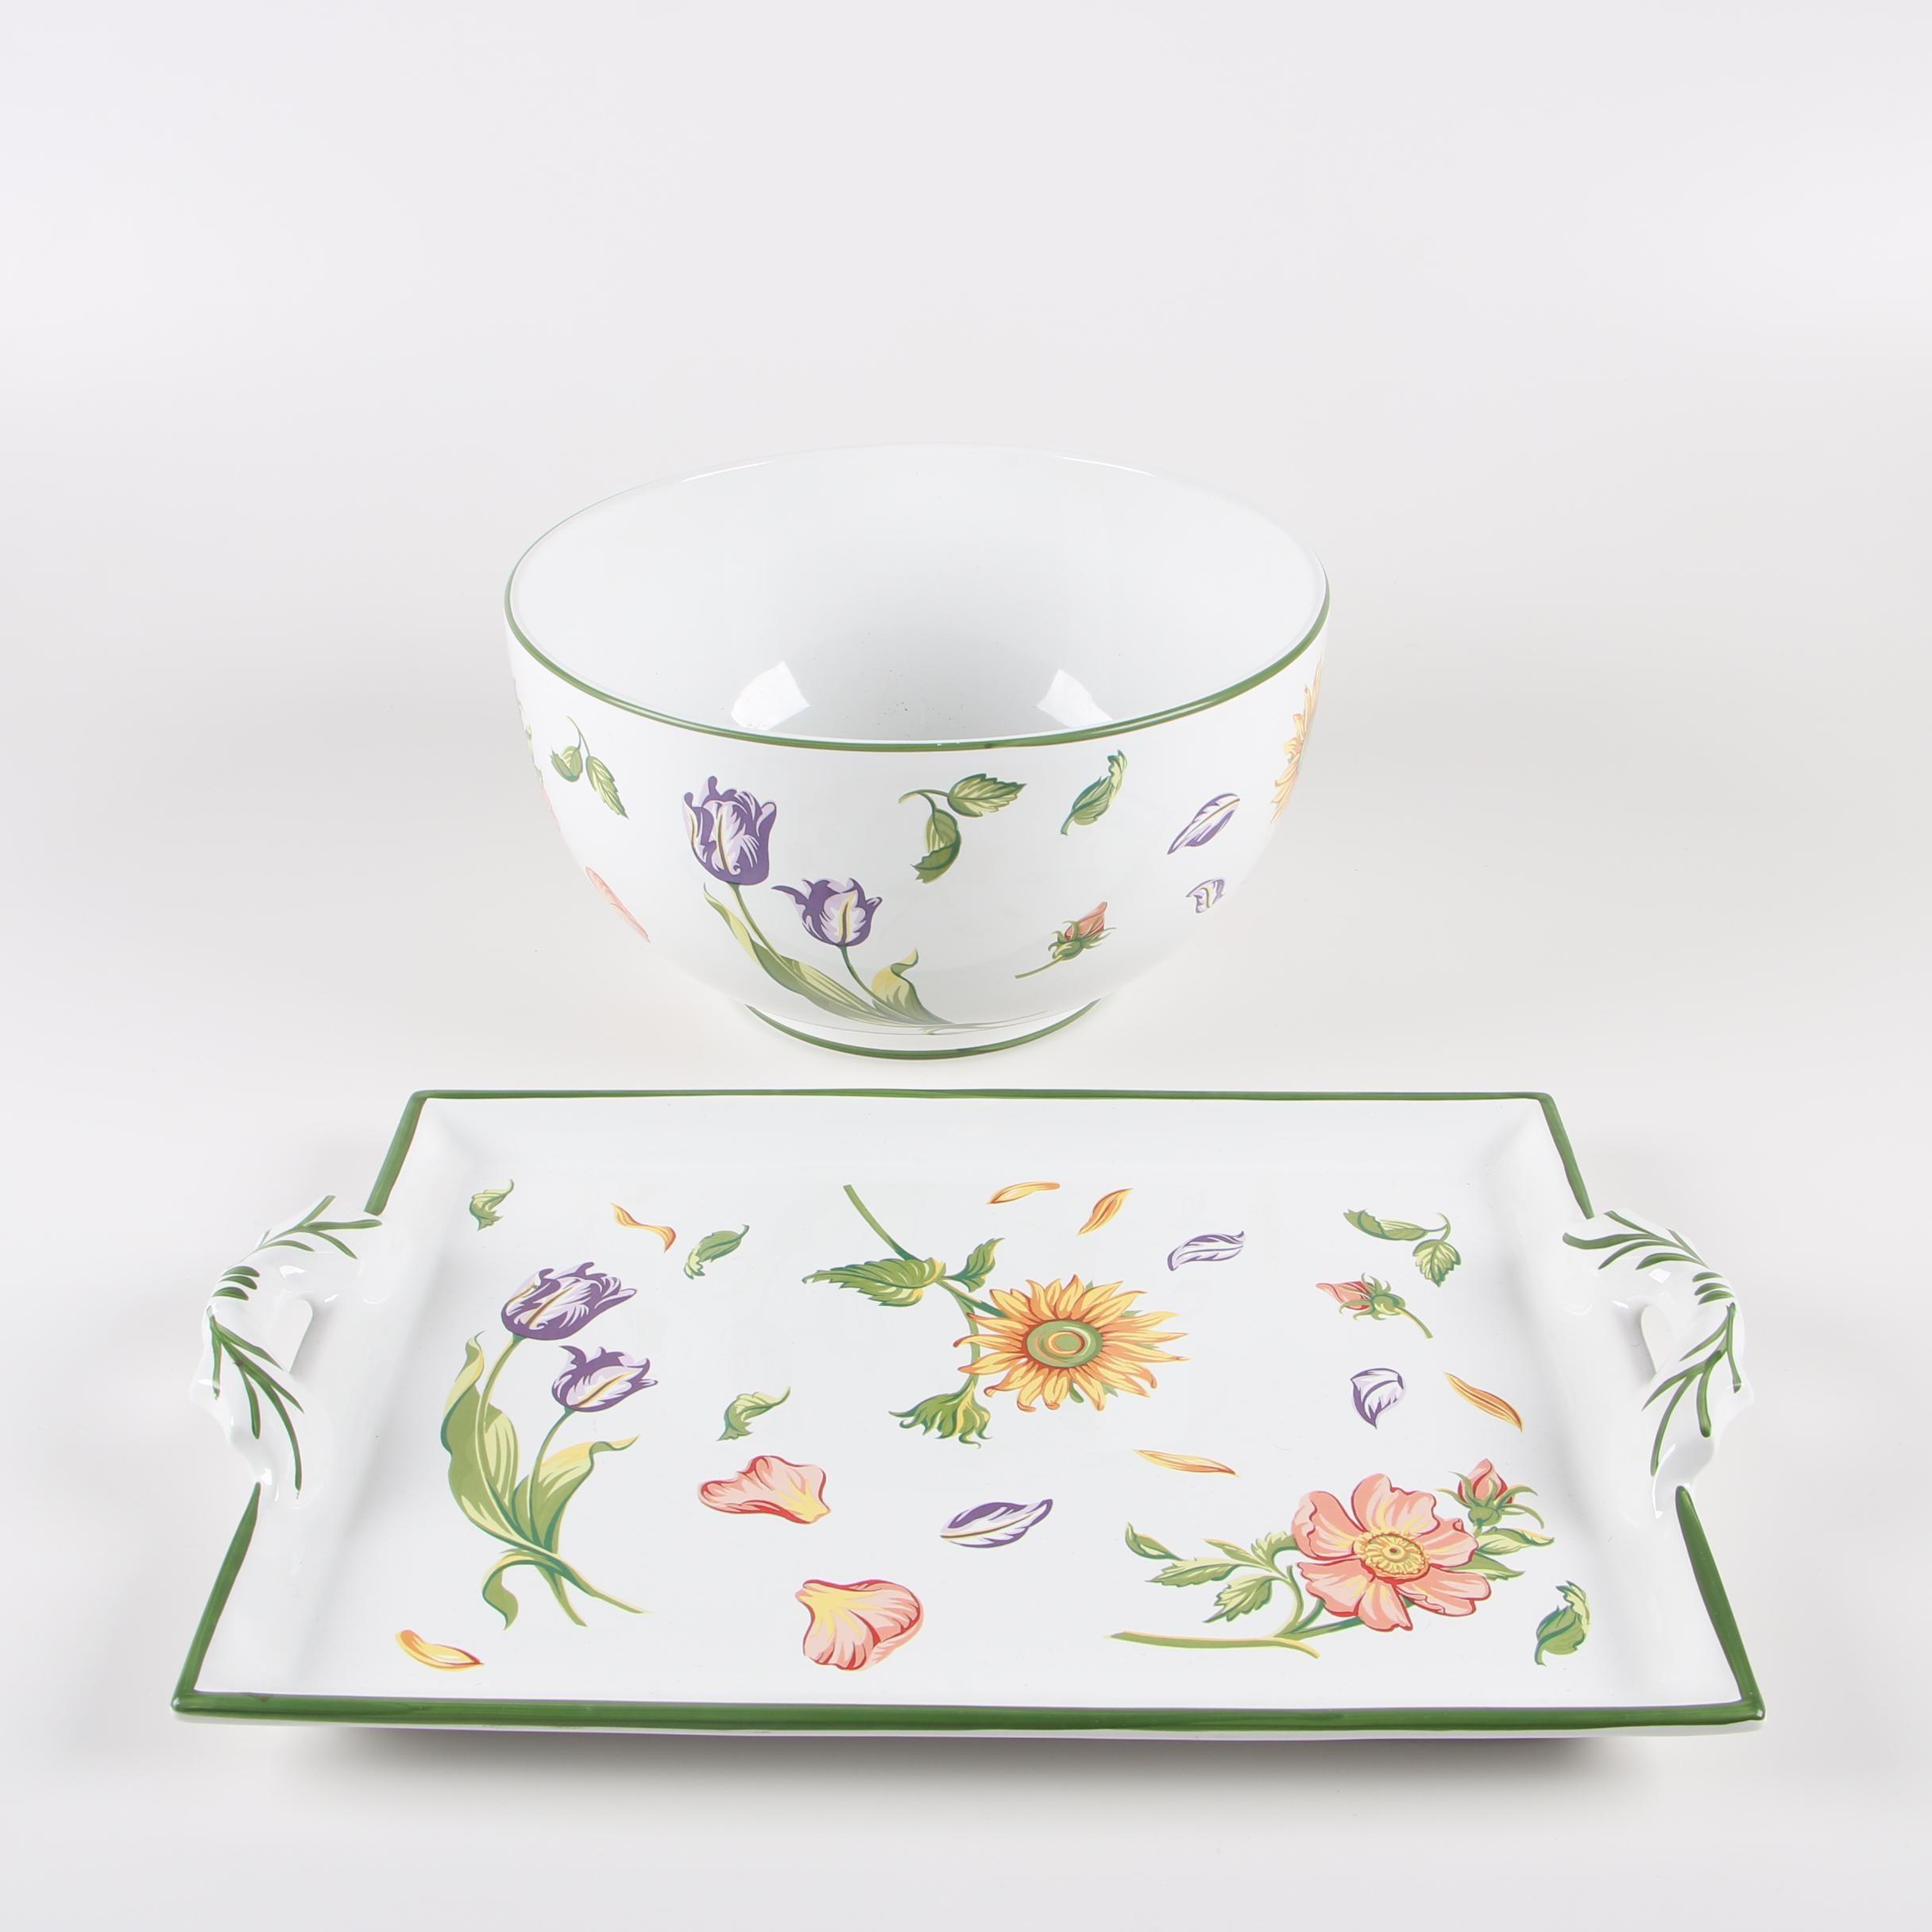 "Tiffany & Co. ""Tiffany Petals"" Serving Bowl and Handled Tray"